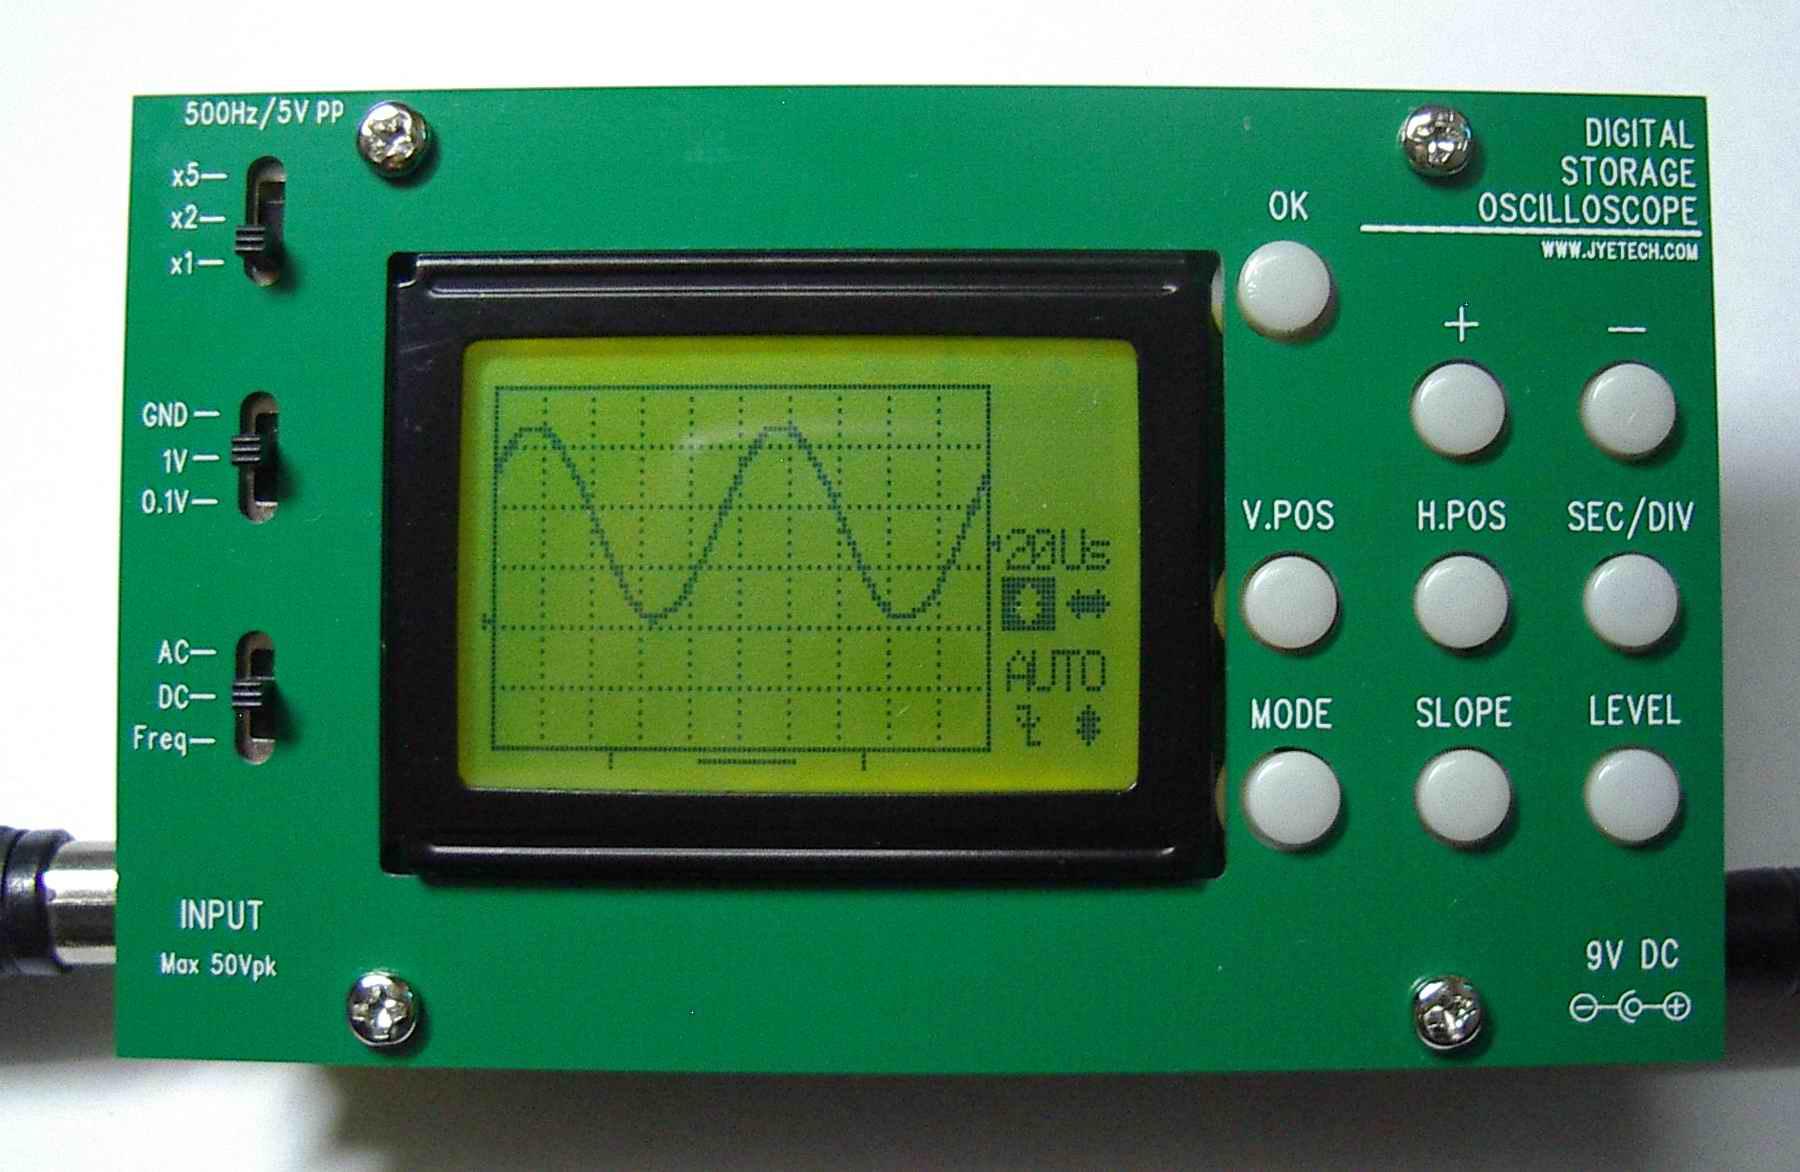 Oscilloscope Model Number : Jye tech diy oscilloscopes kits for hobbyists